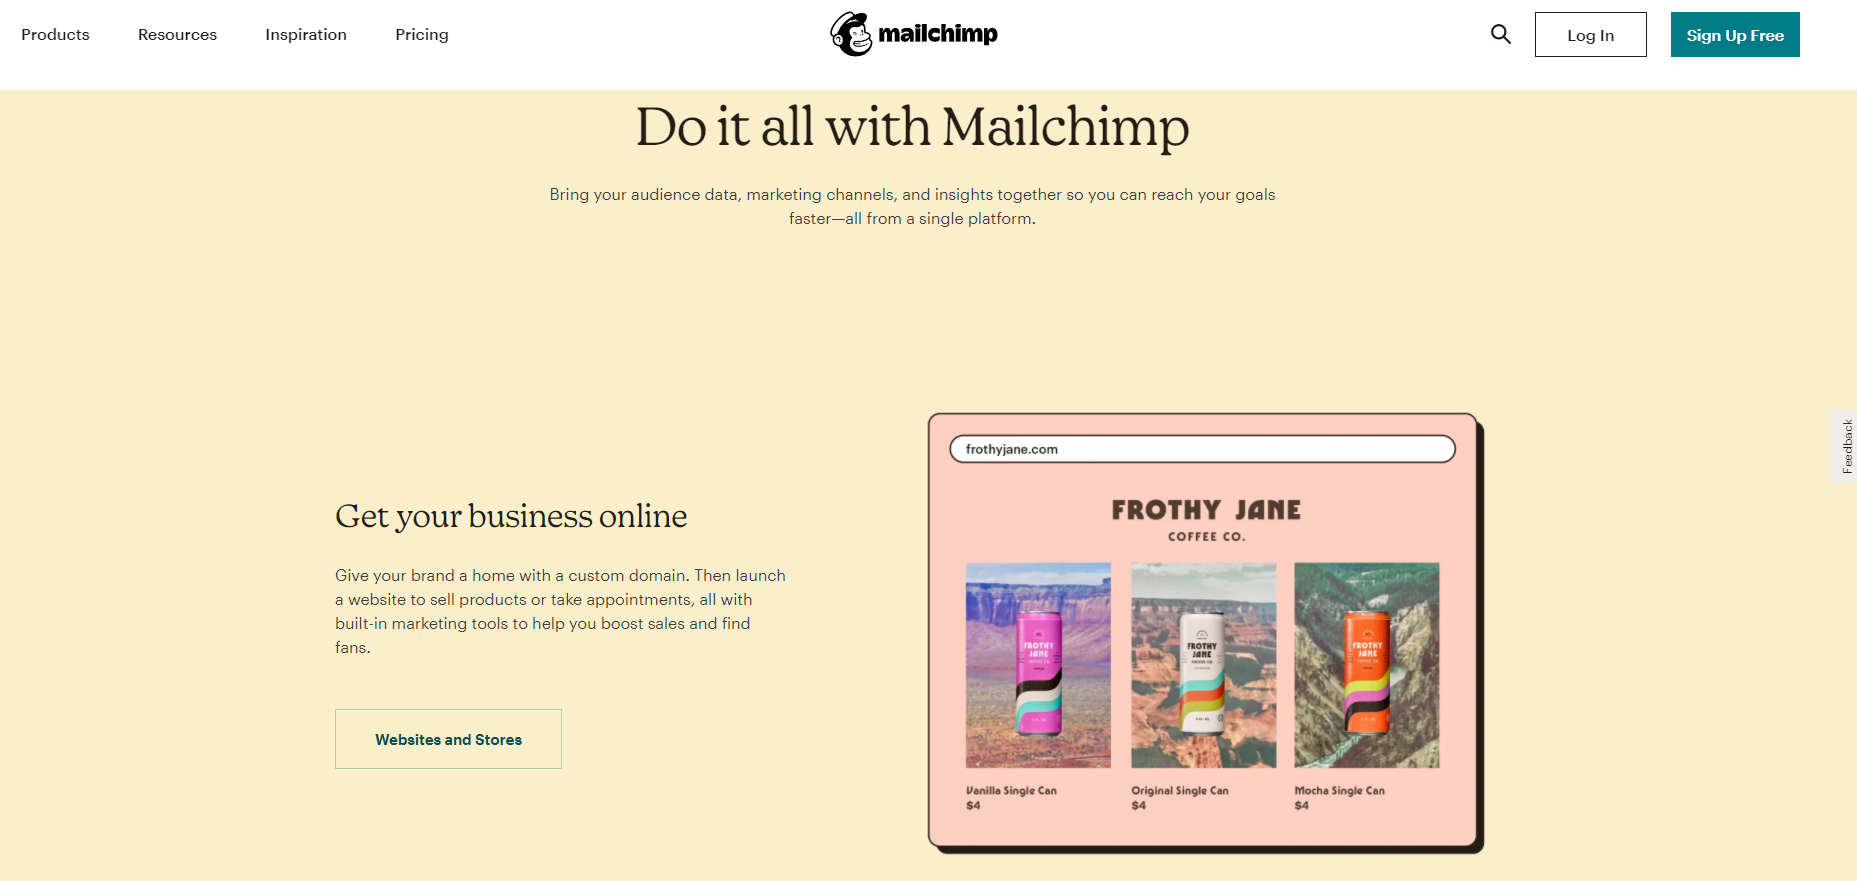 Tool Review: Mailchimp